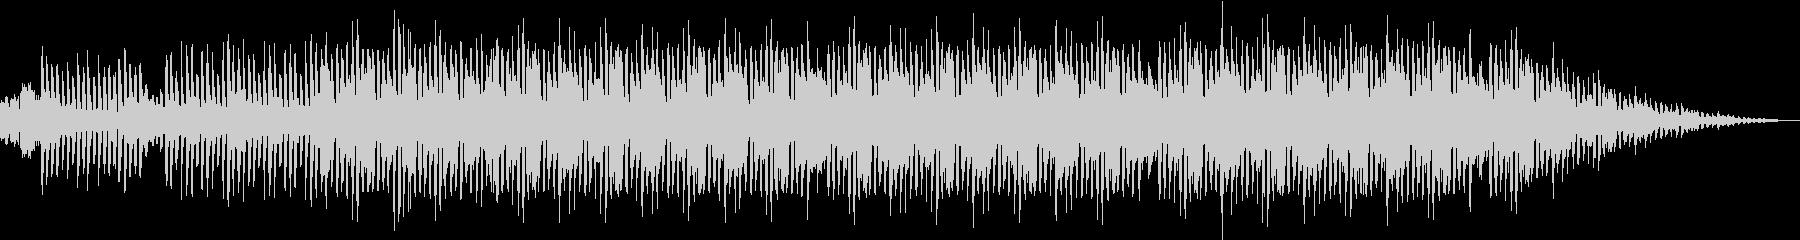 bassの効いたclubmusicの未再生の波形